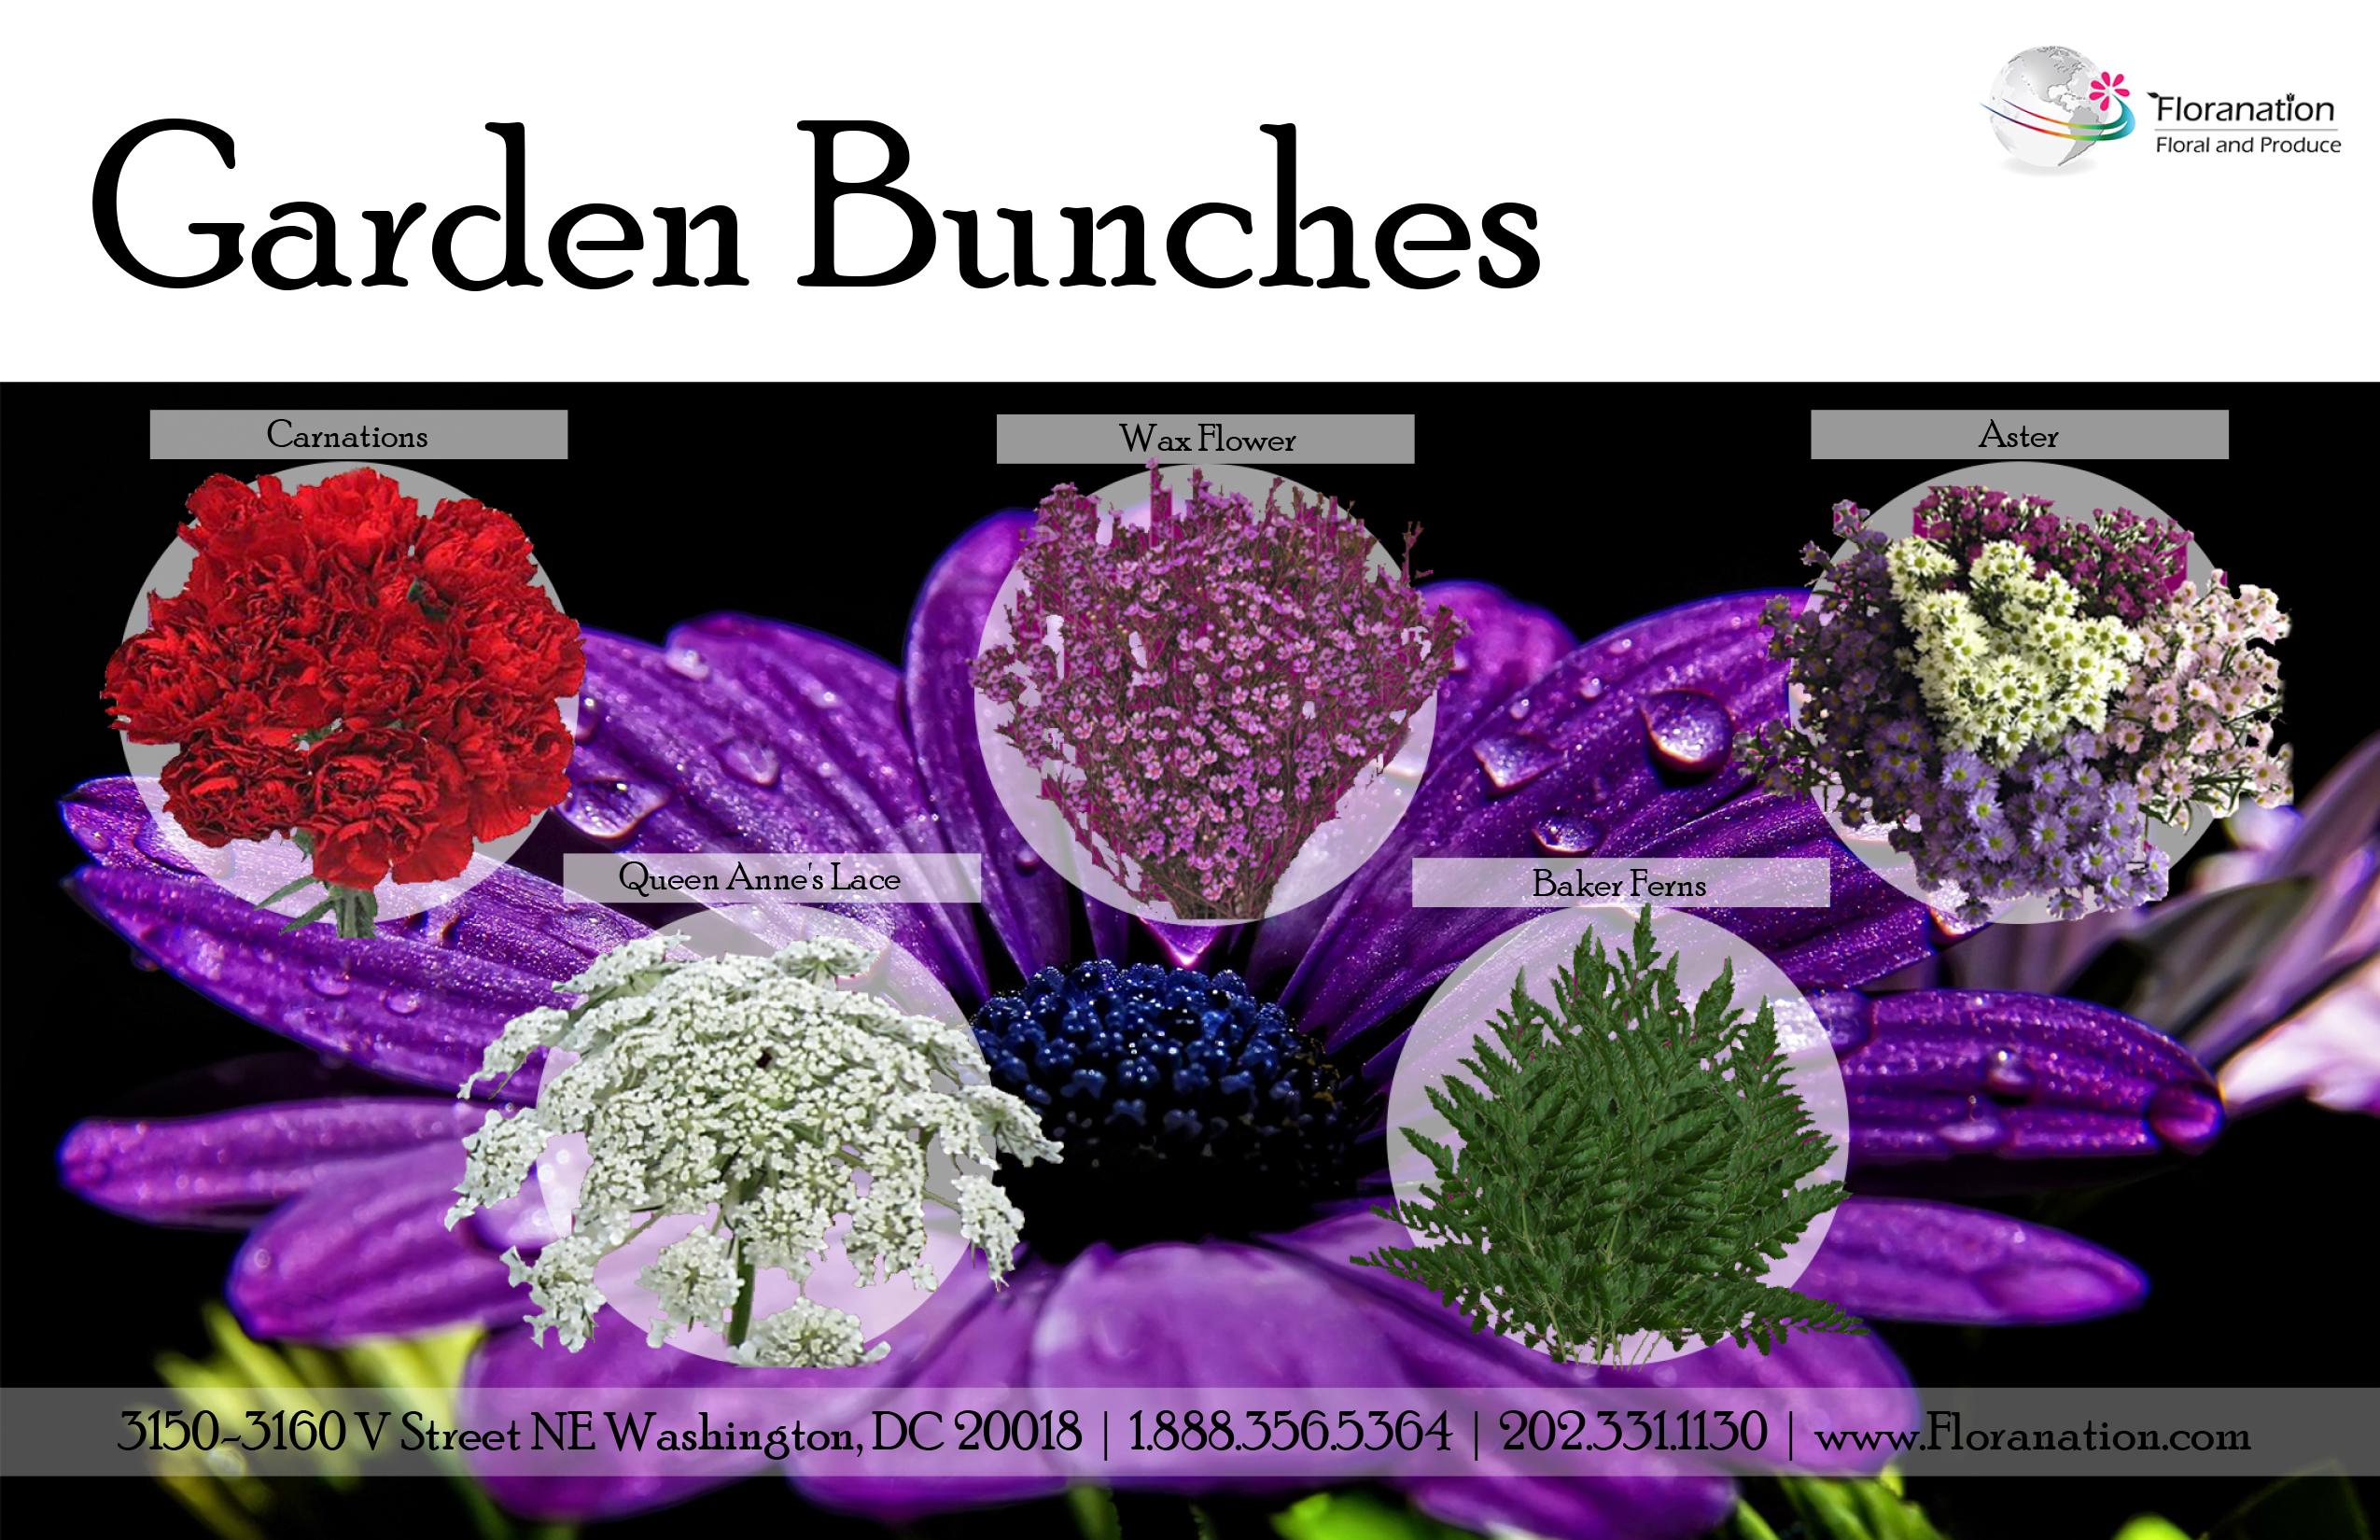 Garden Bunches